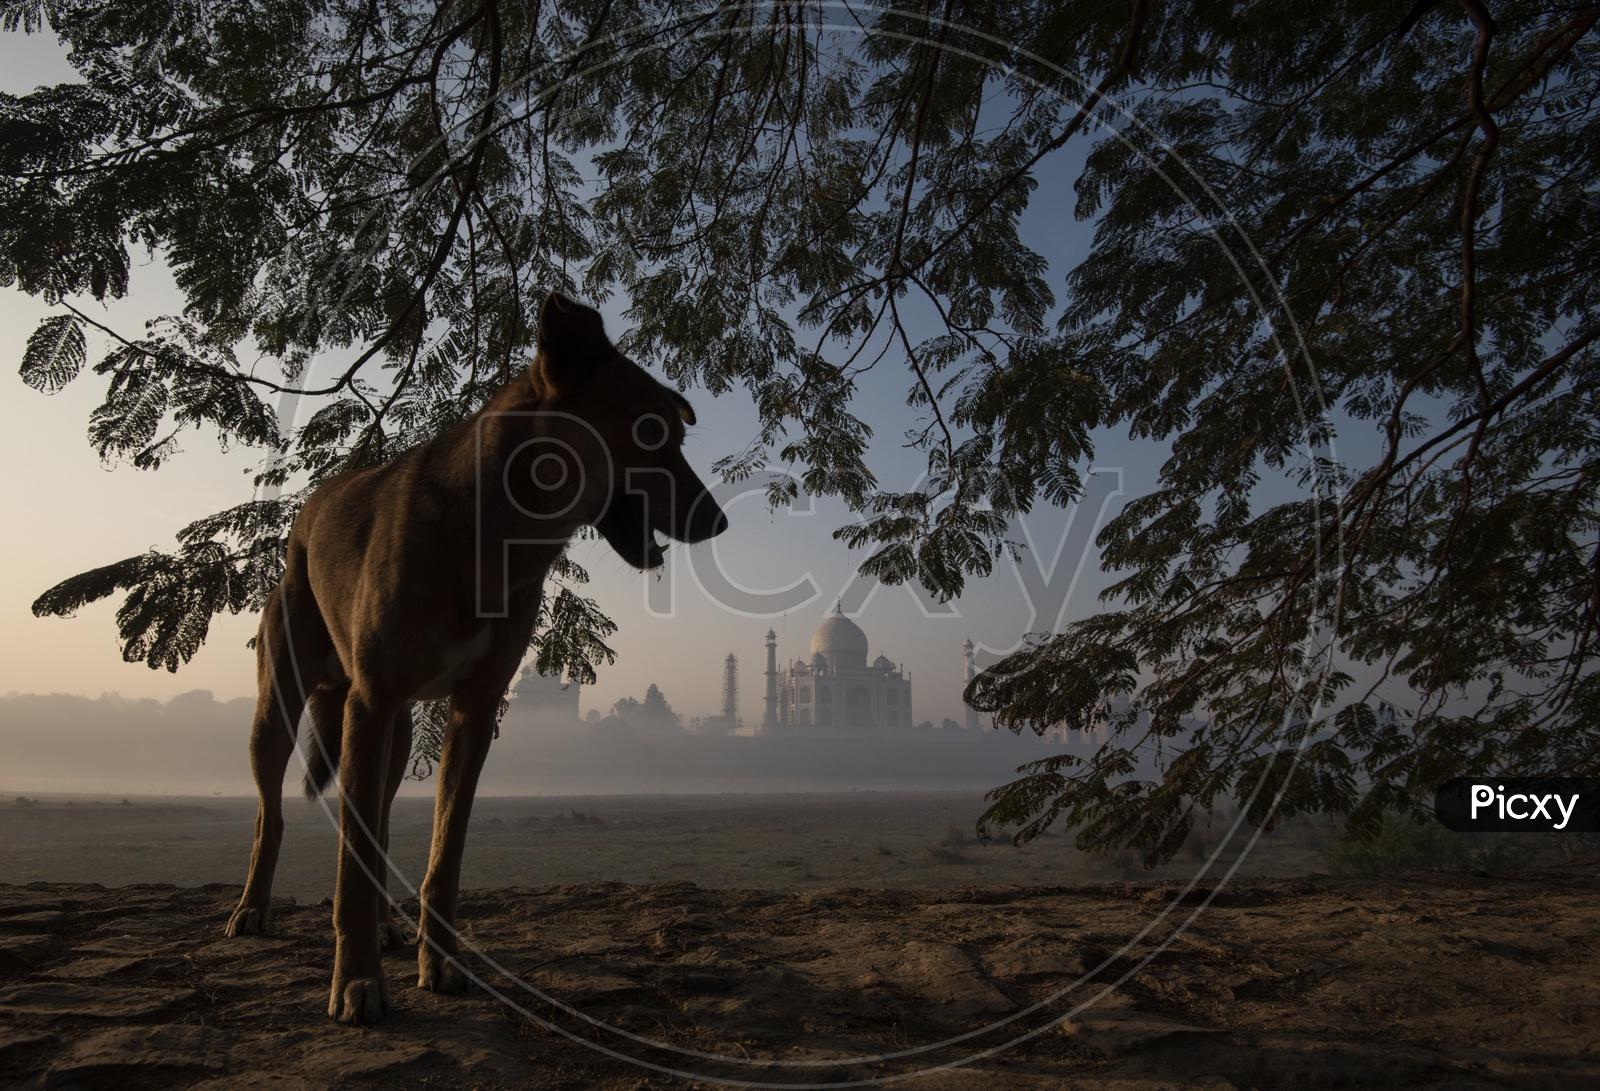 Dog and Taj Mahal